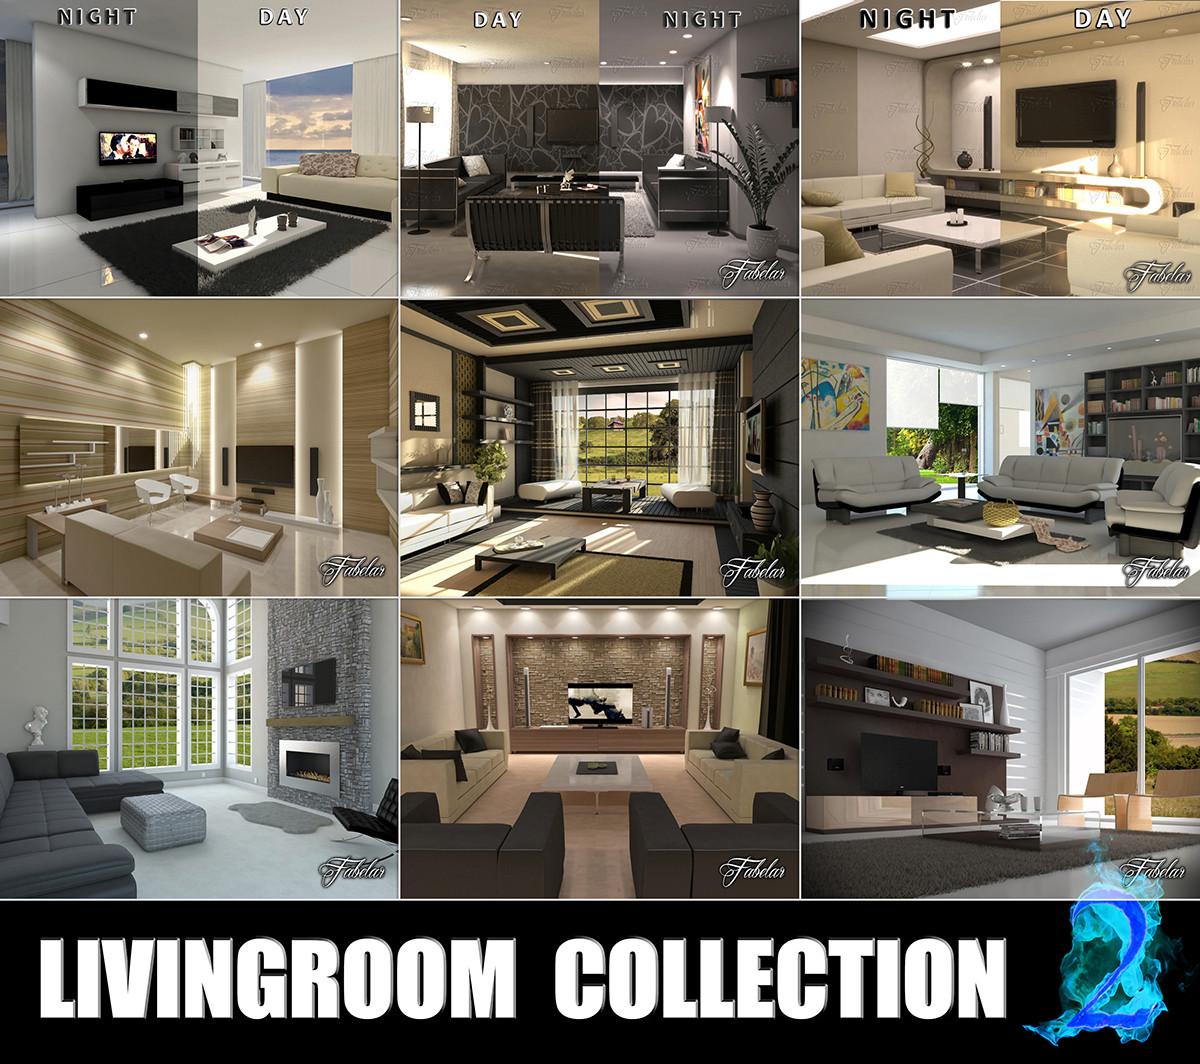 livingcoll2_OFF.jpg